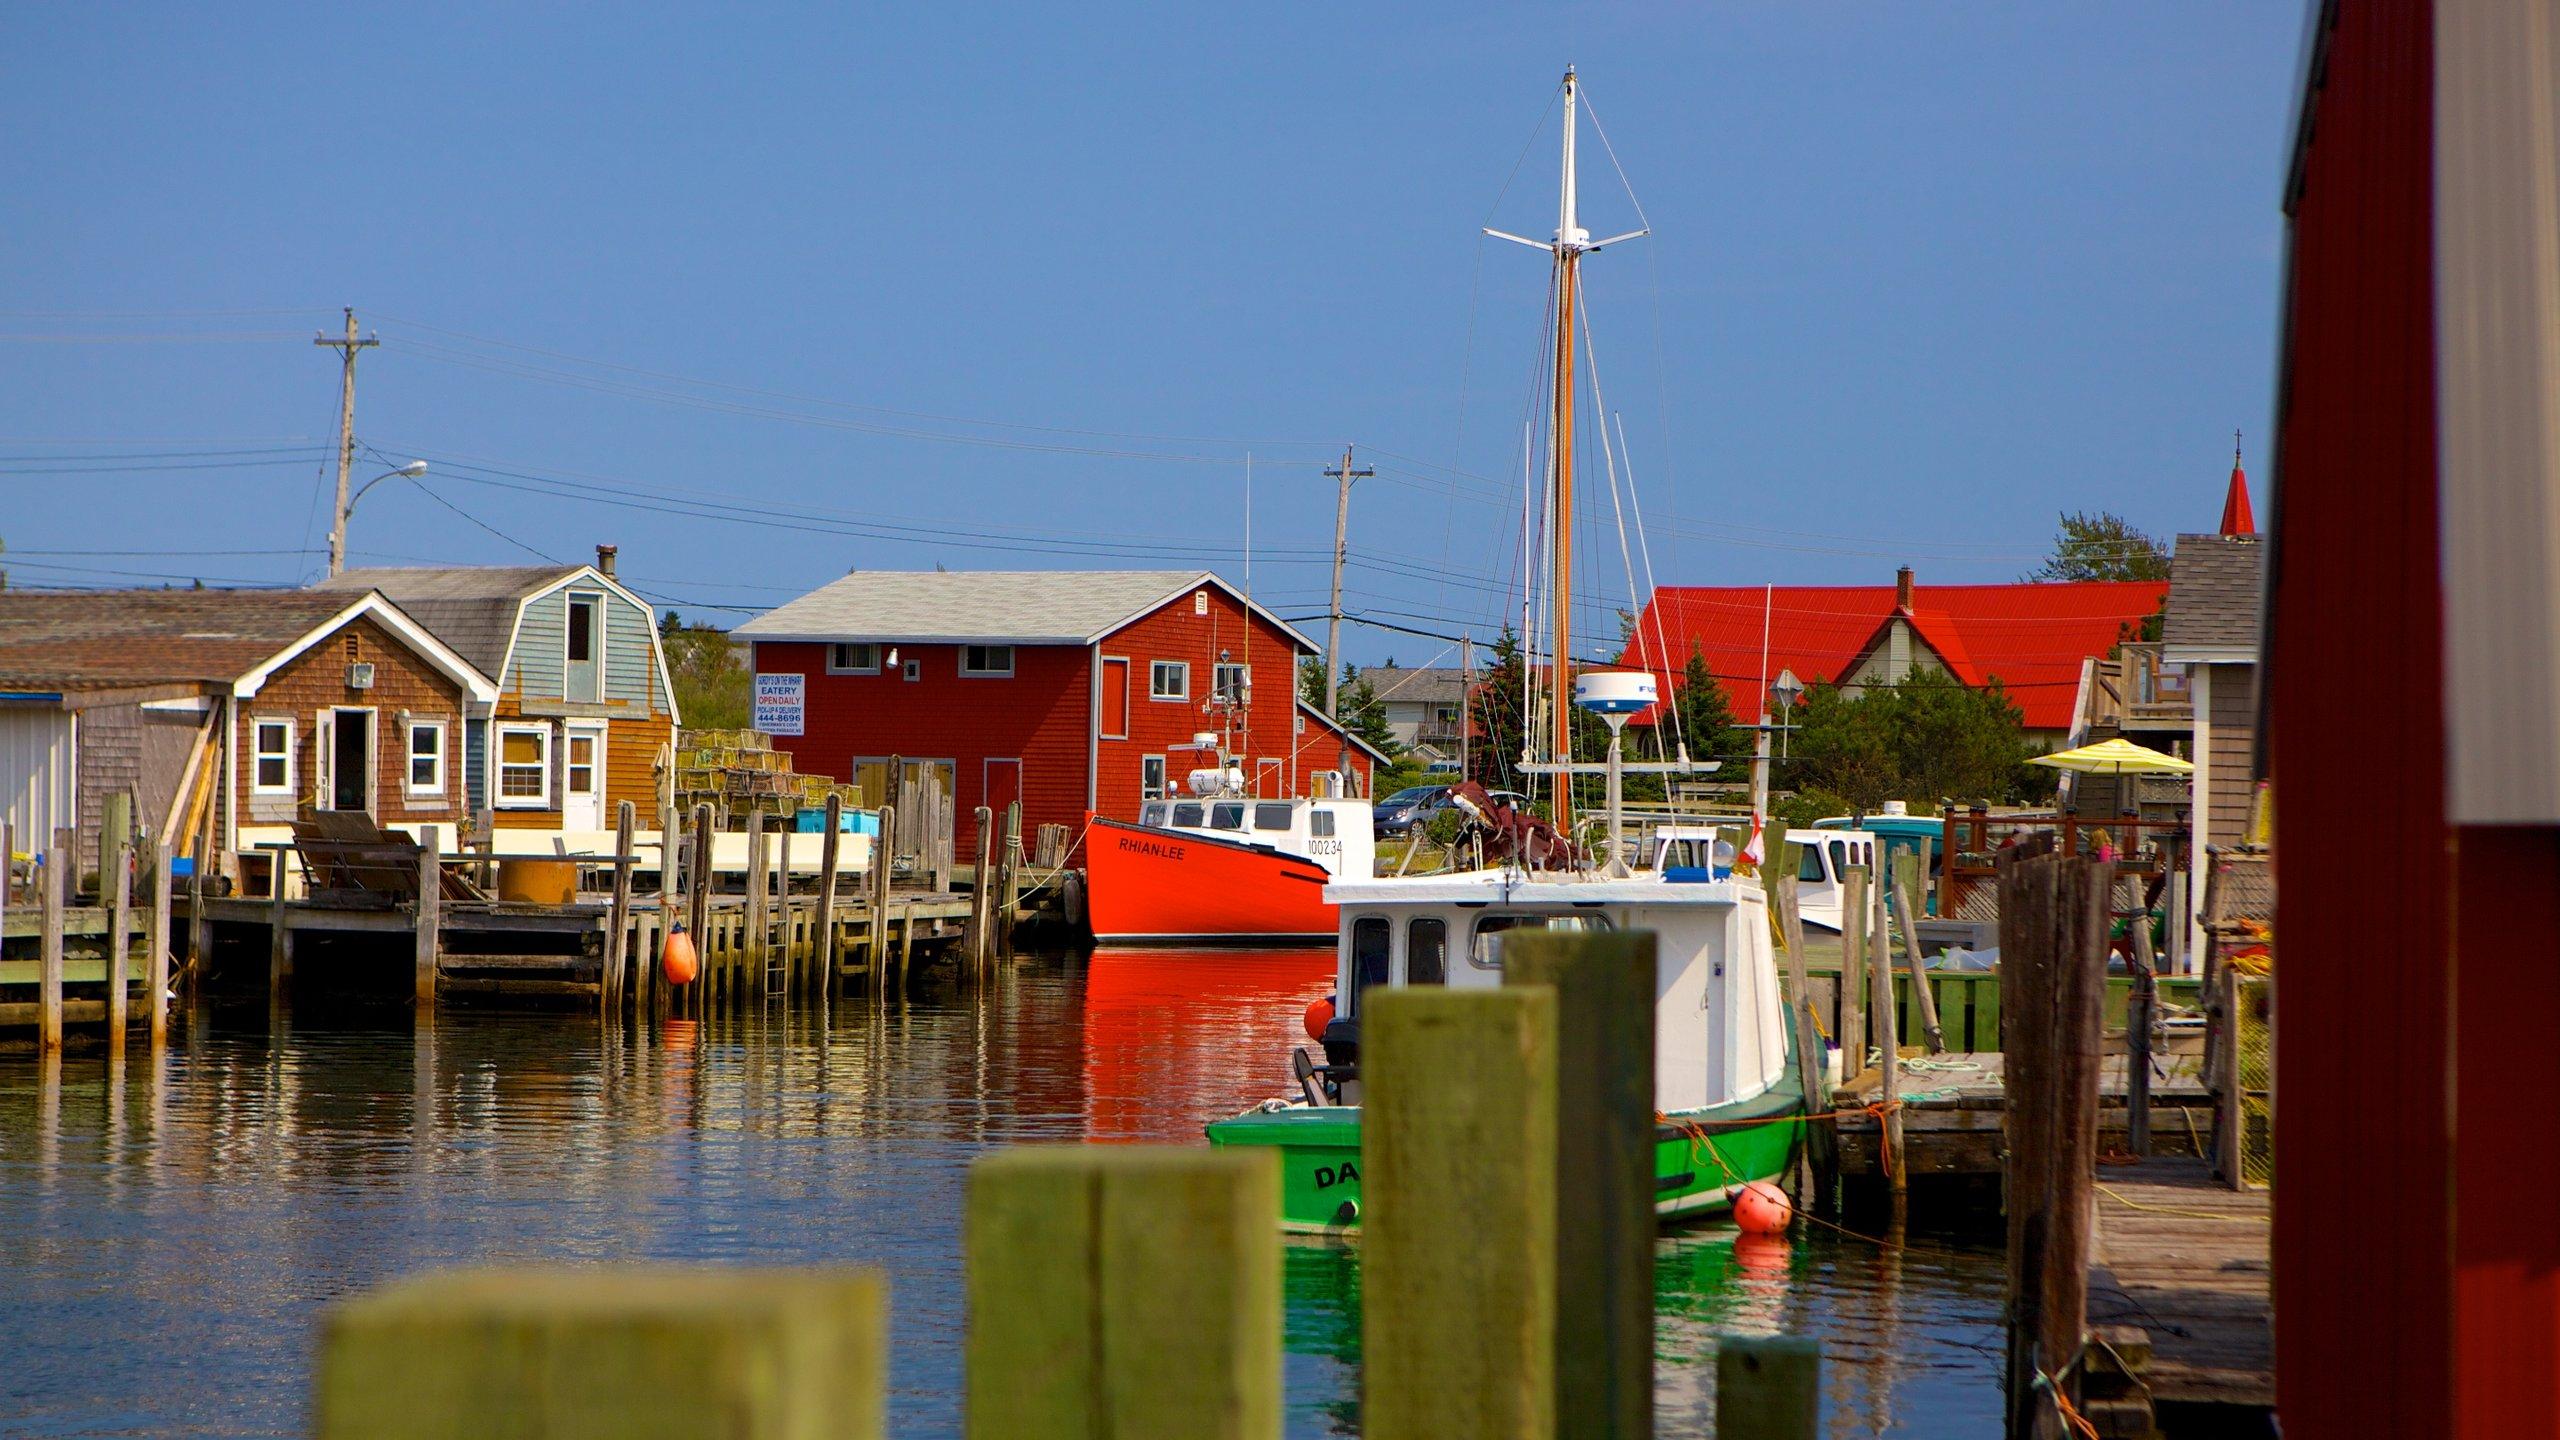 Fisherman's Cove, Eastern Passage, Nova Scotia, Canada